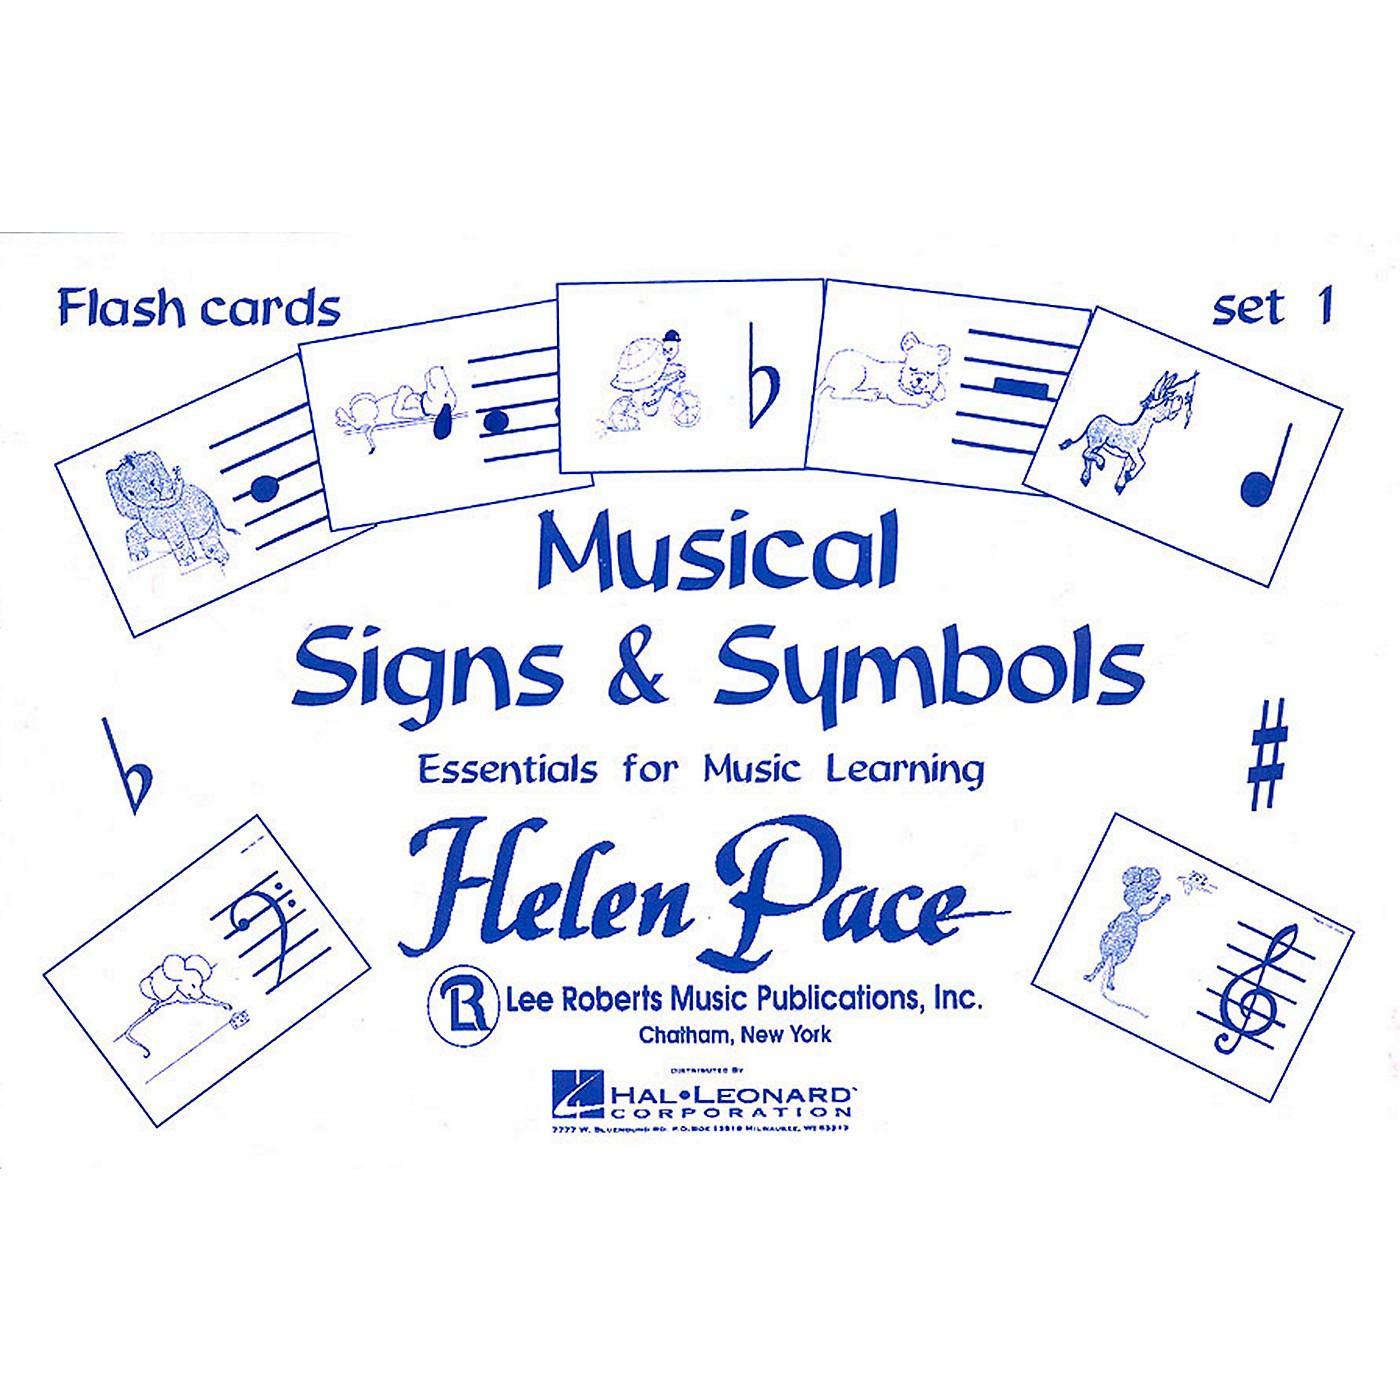 Hal Leonard Musical Signs And Symbols Set I 24 Cards 48 Sides Flash Cards Moppet thumbnail